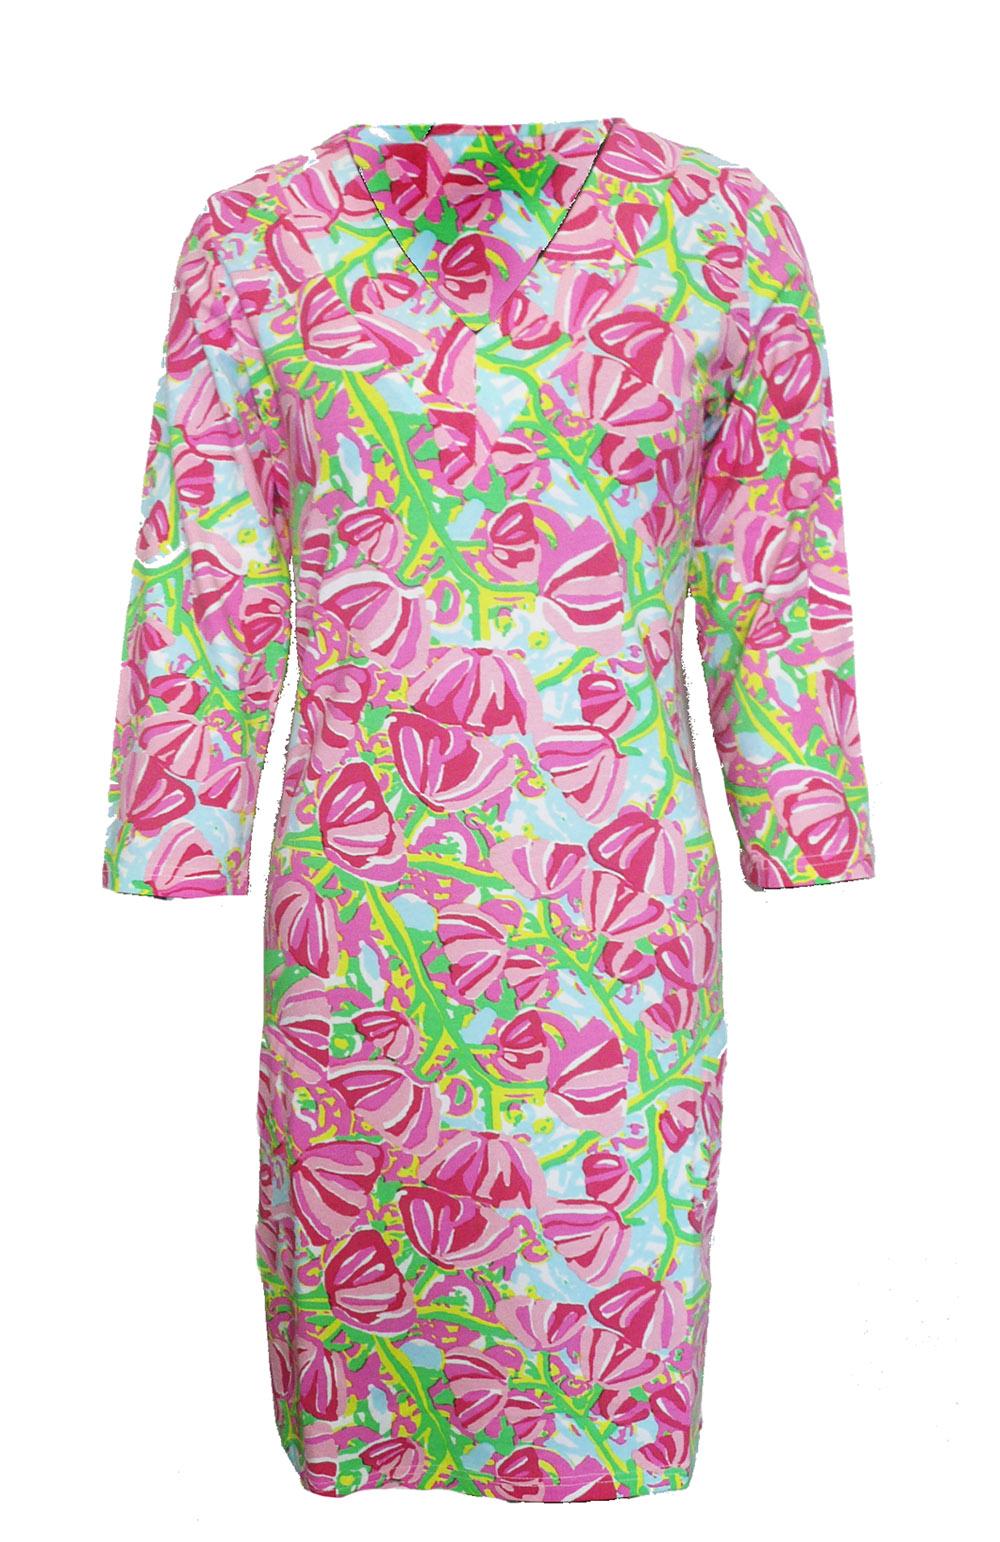 dress cotton pnk prnt.jpg